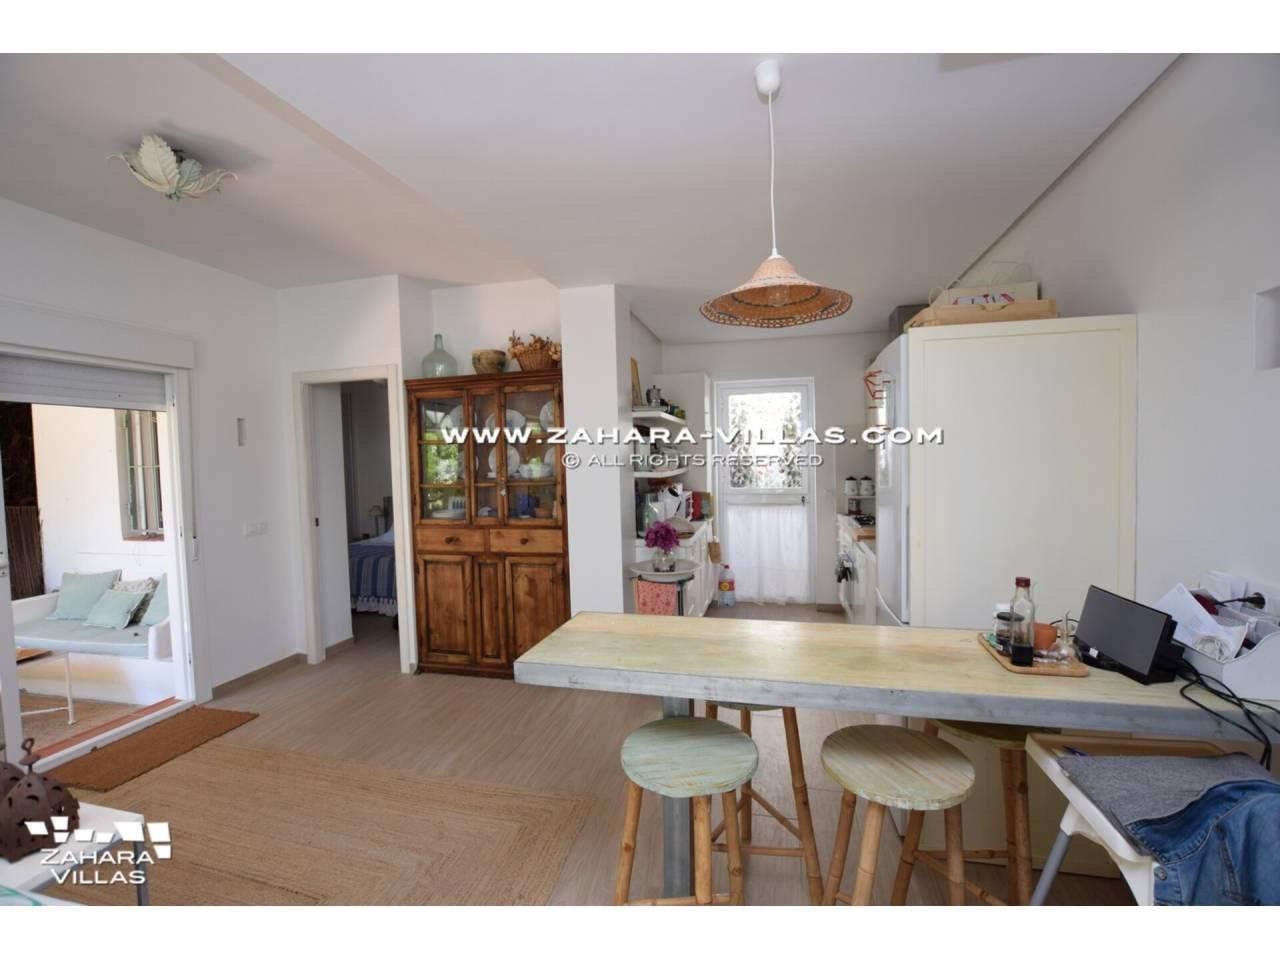 Imagen 9 de House for sale close to the beach, with sea views in Zahara de los Atunes